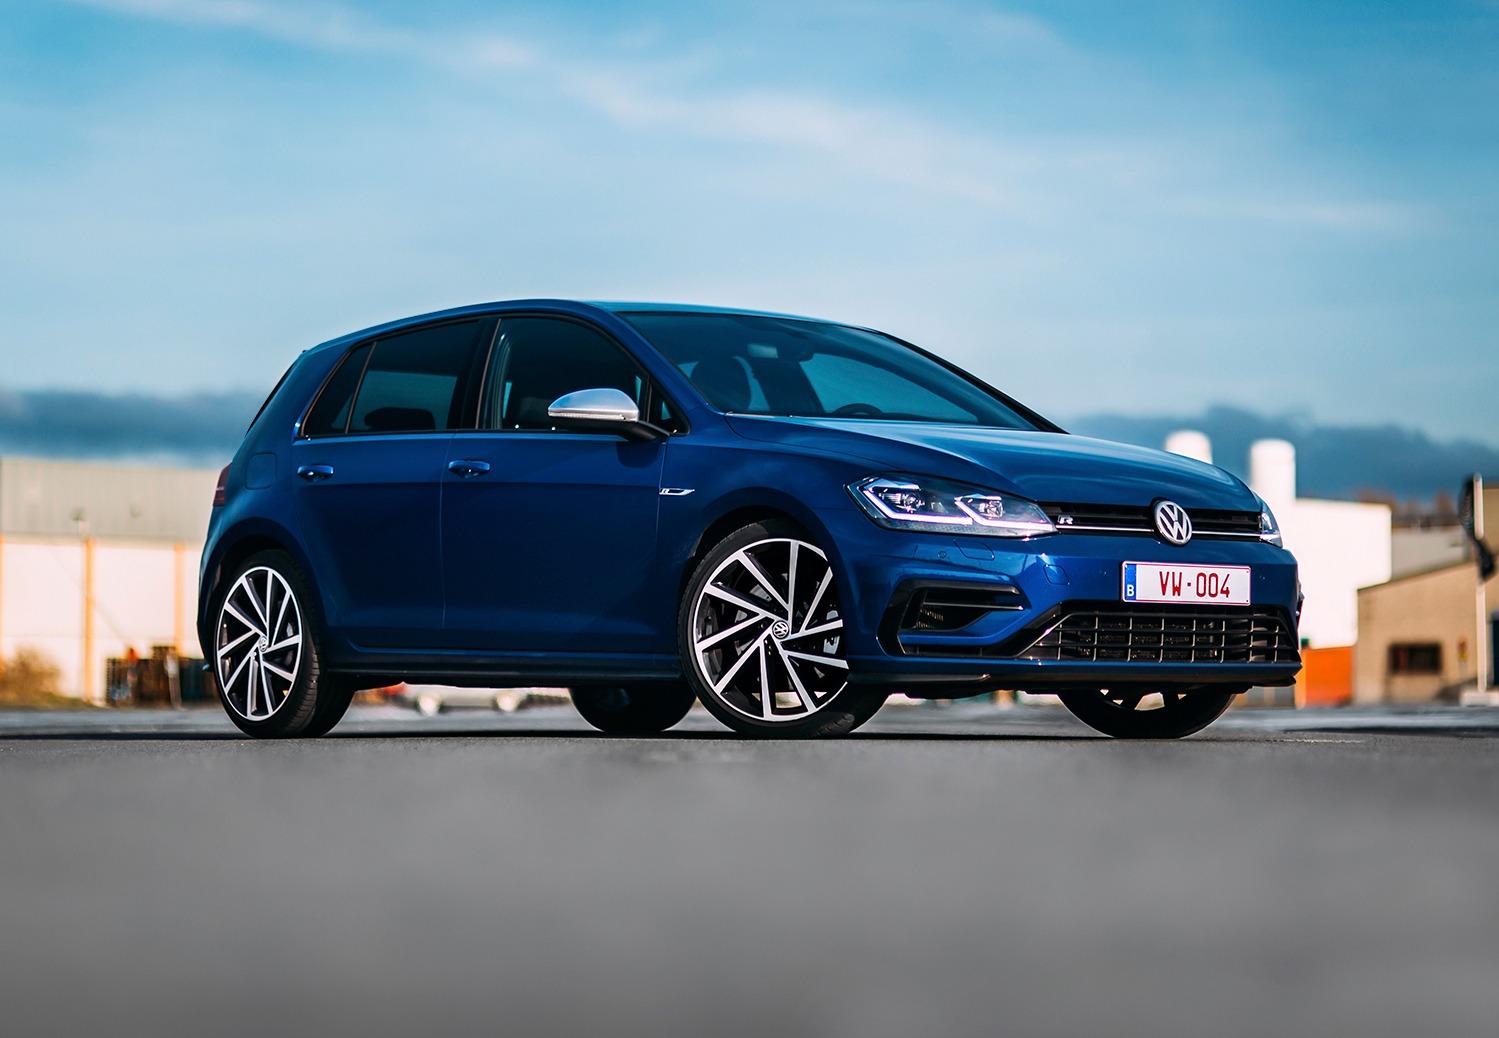 Rijtest: Volkswagen Golf 7.5 R Performance